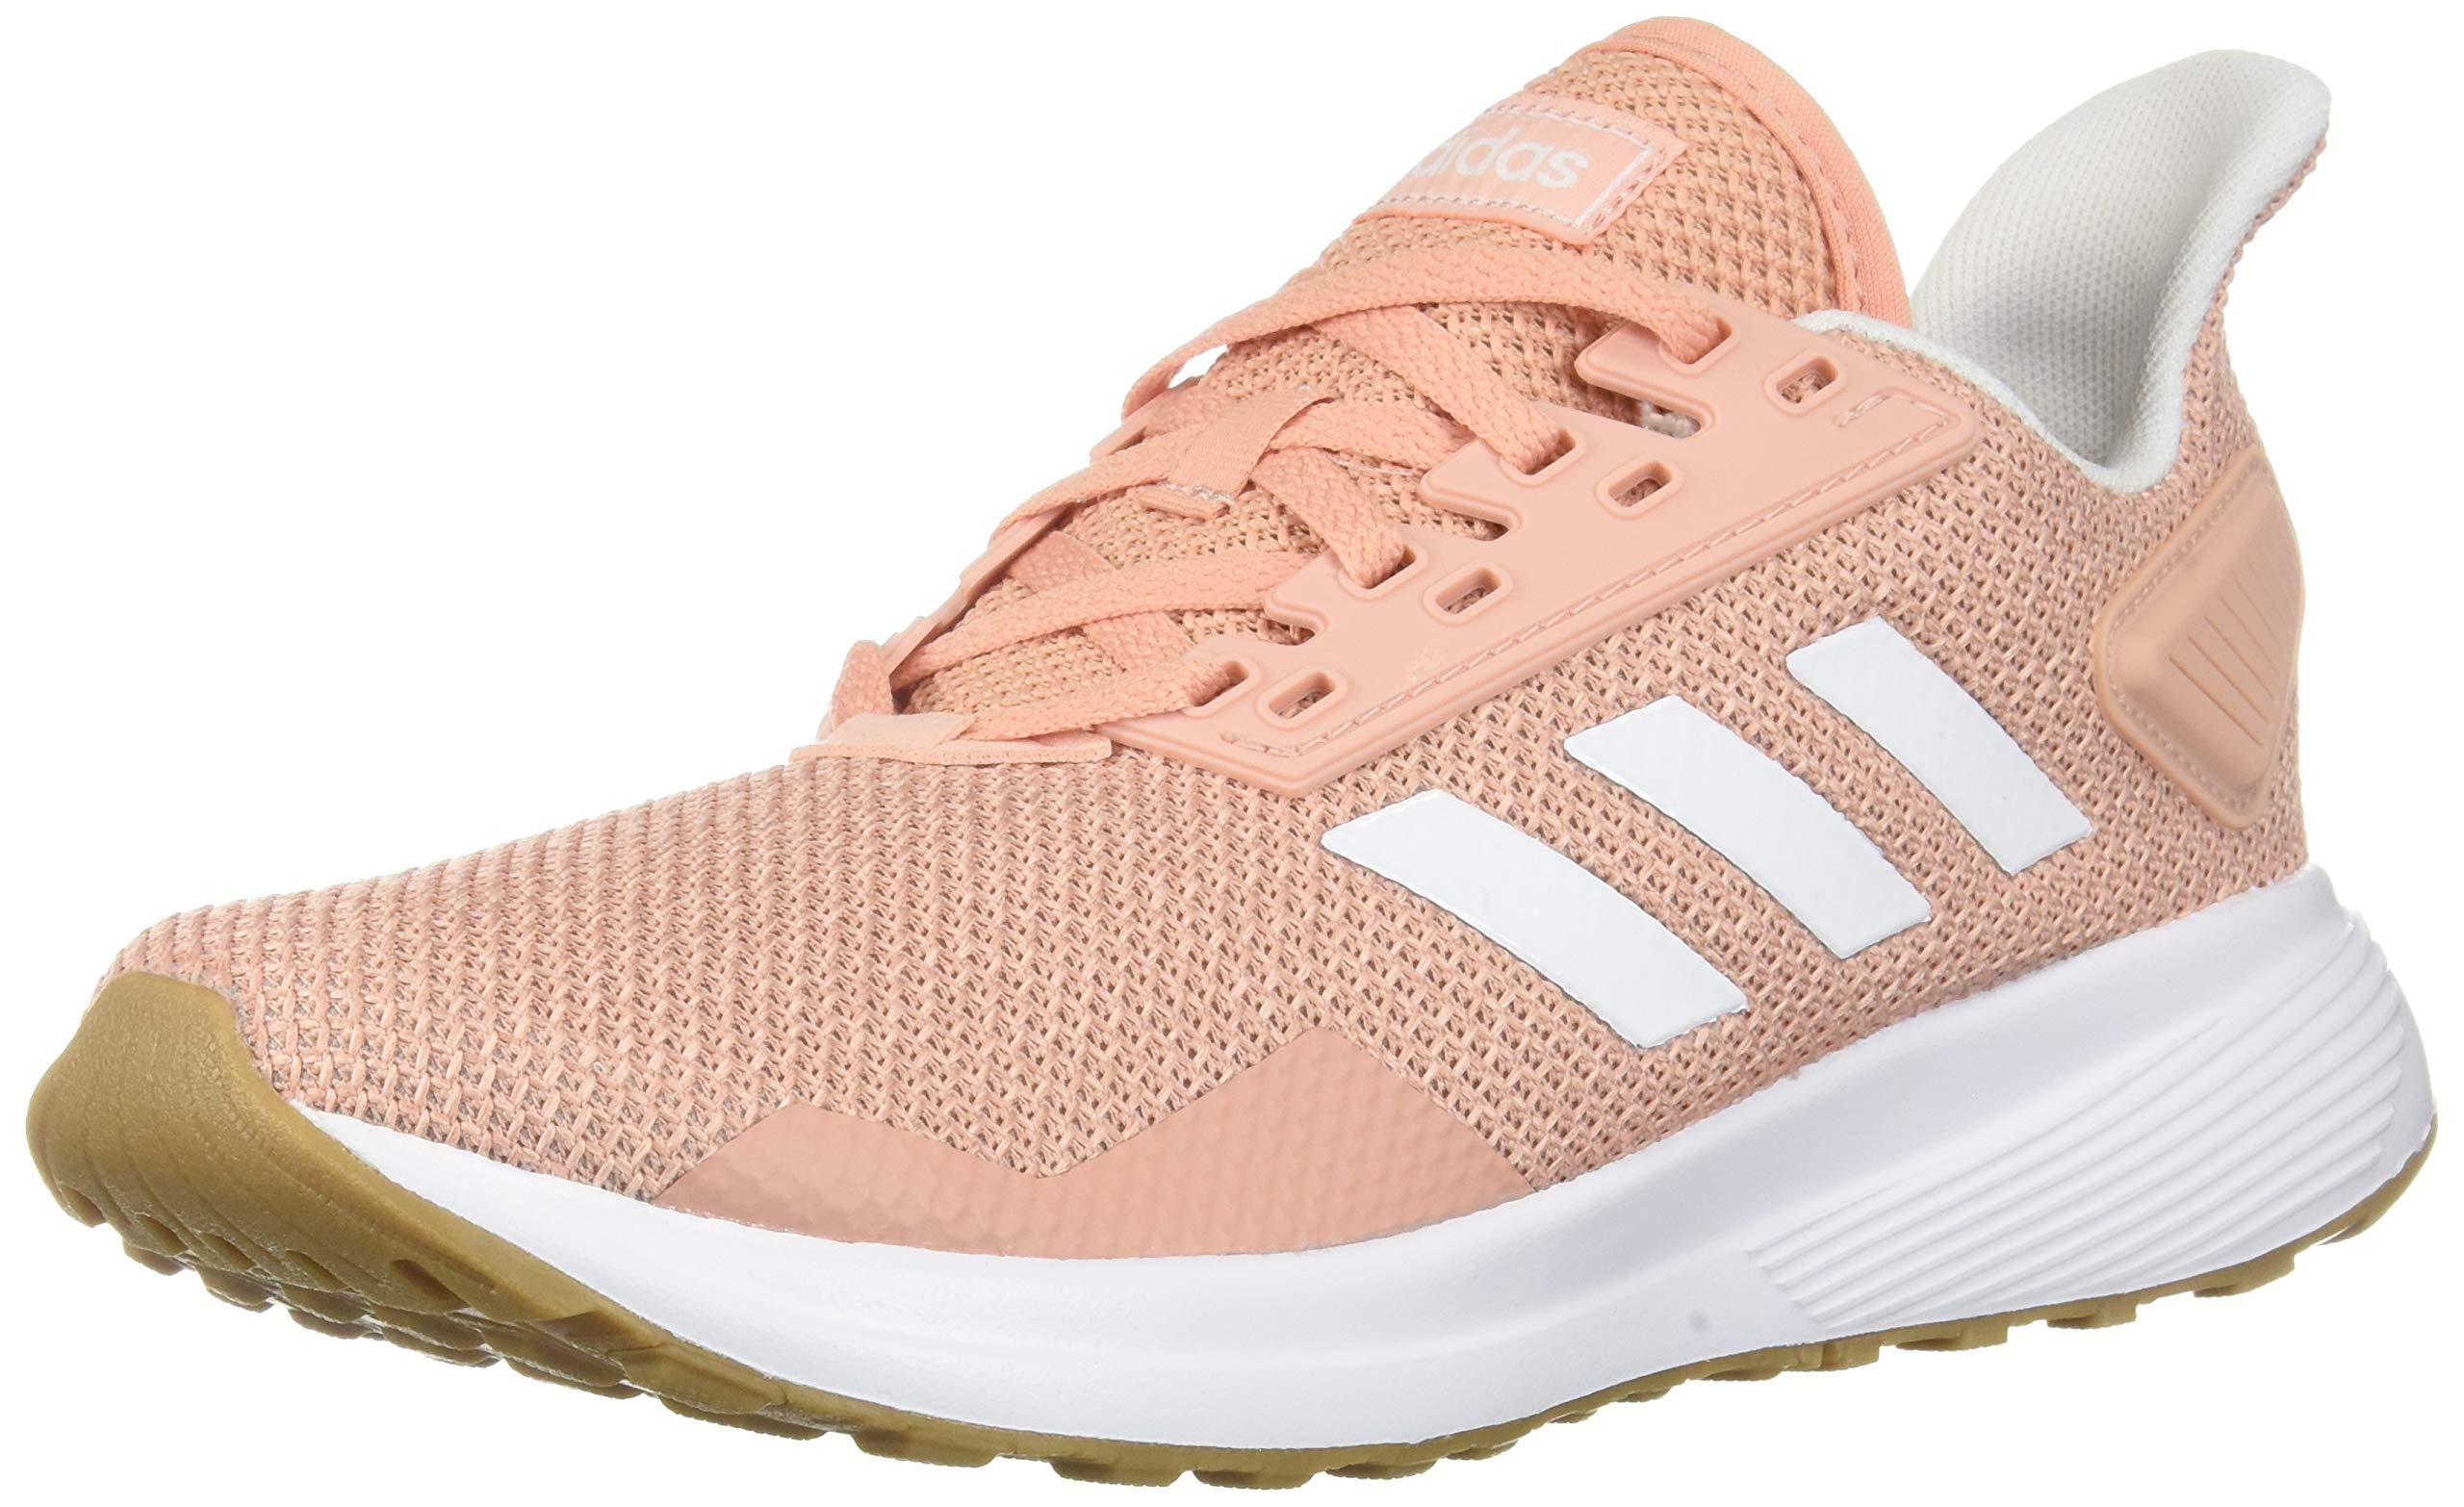 adidas Women's Duramo 9 Running Shoe, dust Pink/White/Clear Orange, 5.5 M US by adidas